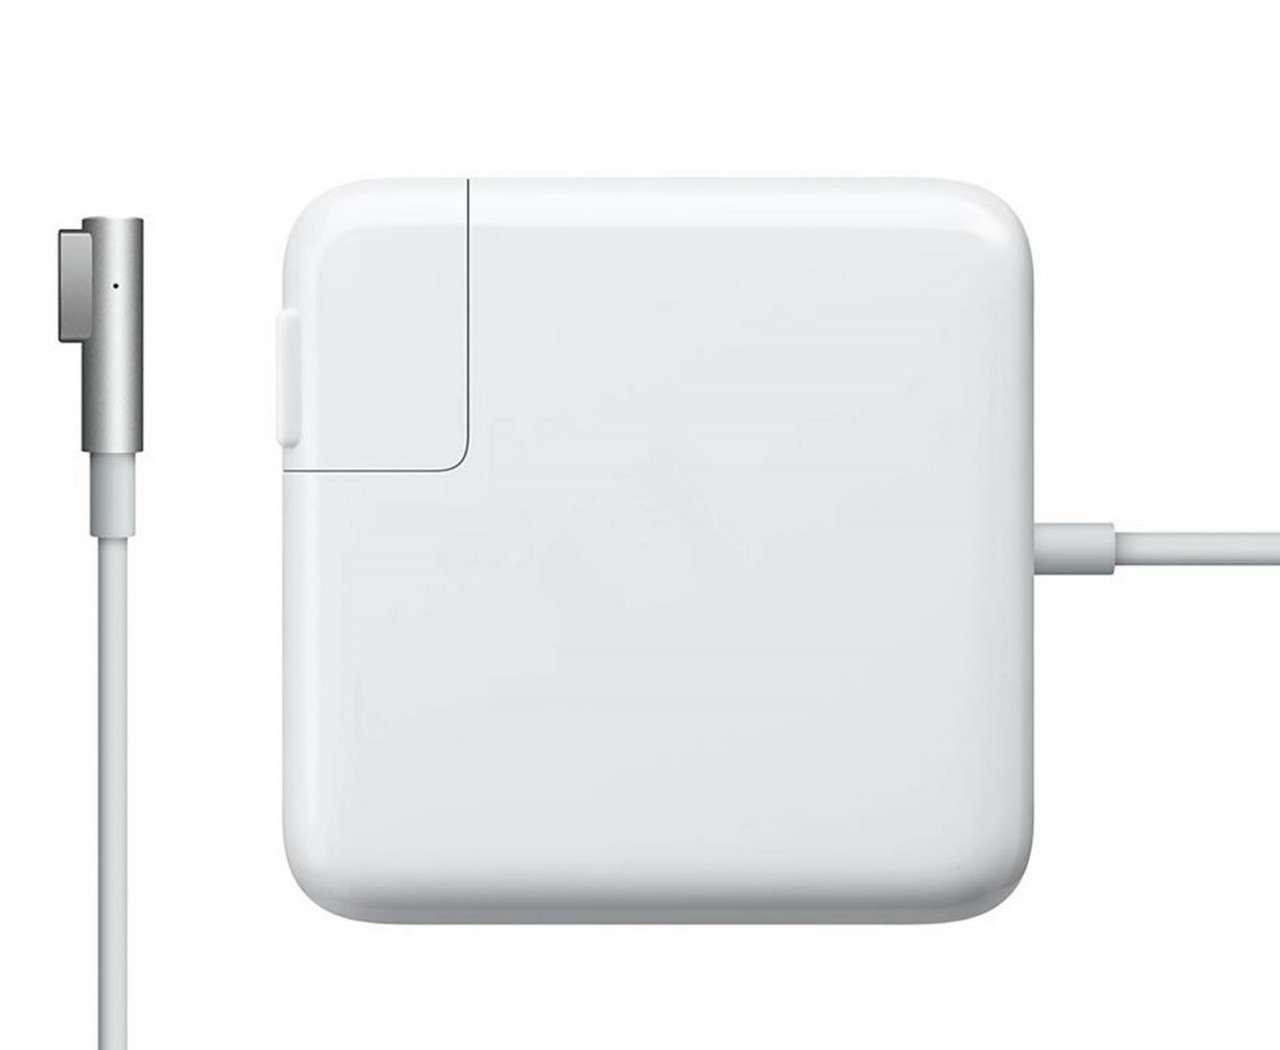 Incarcator Apple ADP 60AD 60W imagine